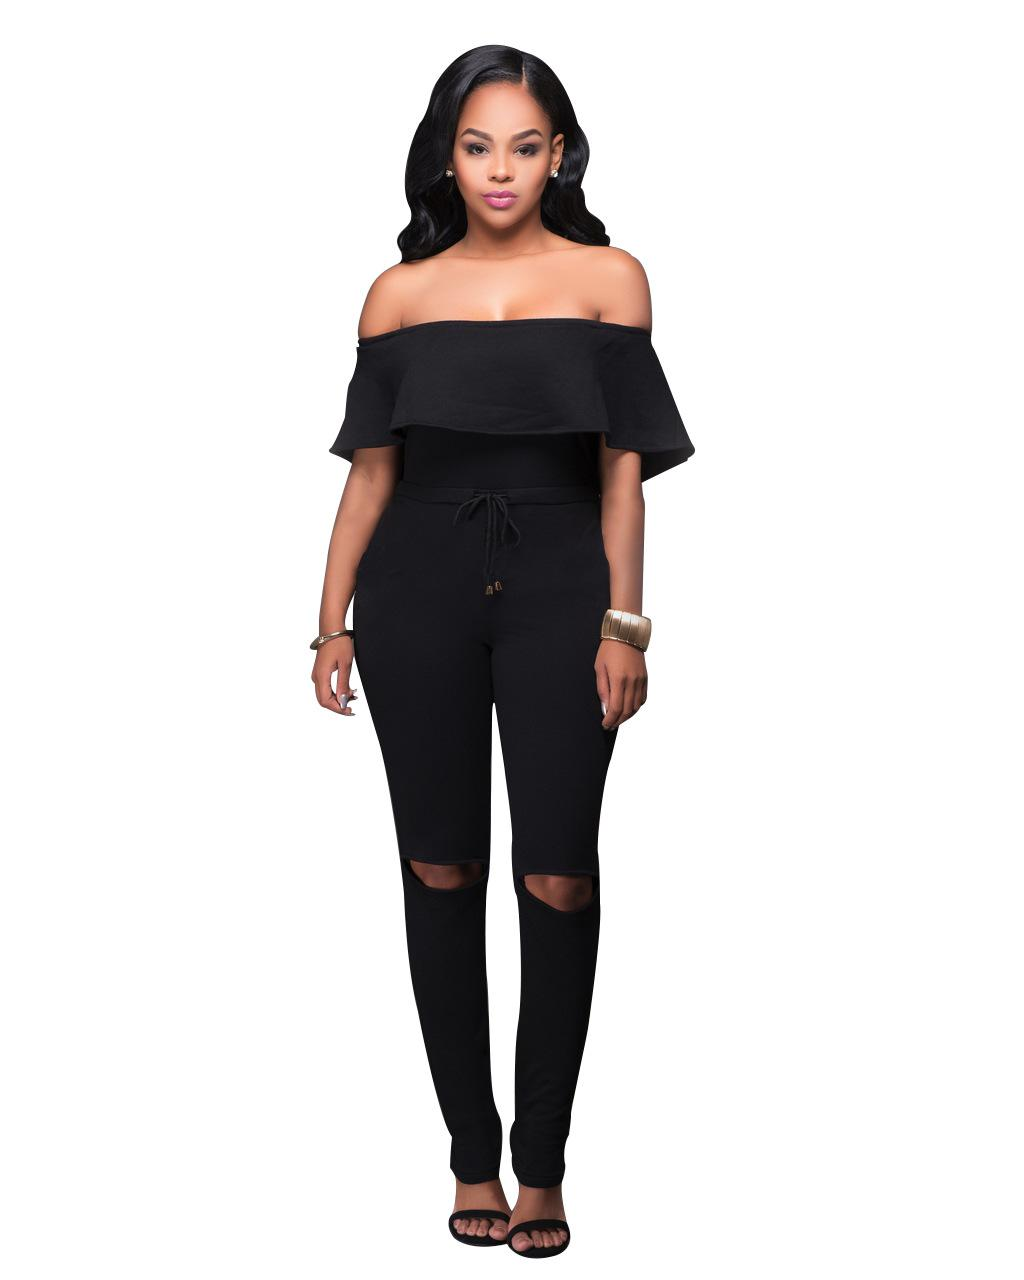 2019 Wholesale Sexy Bodysuit Women Jumpsuit Romper Womens Tops Overalls For  Women Elegant Long Plus Size Body Playsuit Mono Encaje Bayan Tulum From ... dcd5fcbf8f